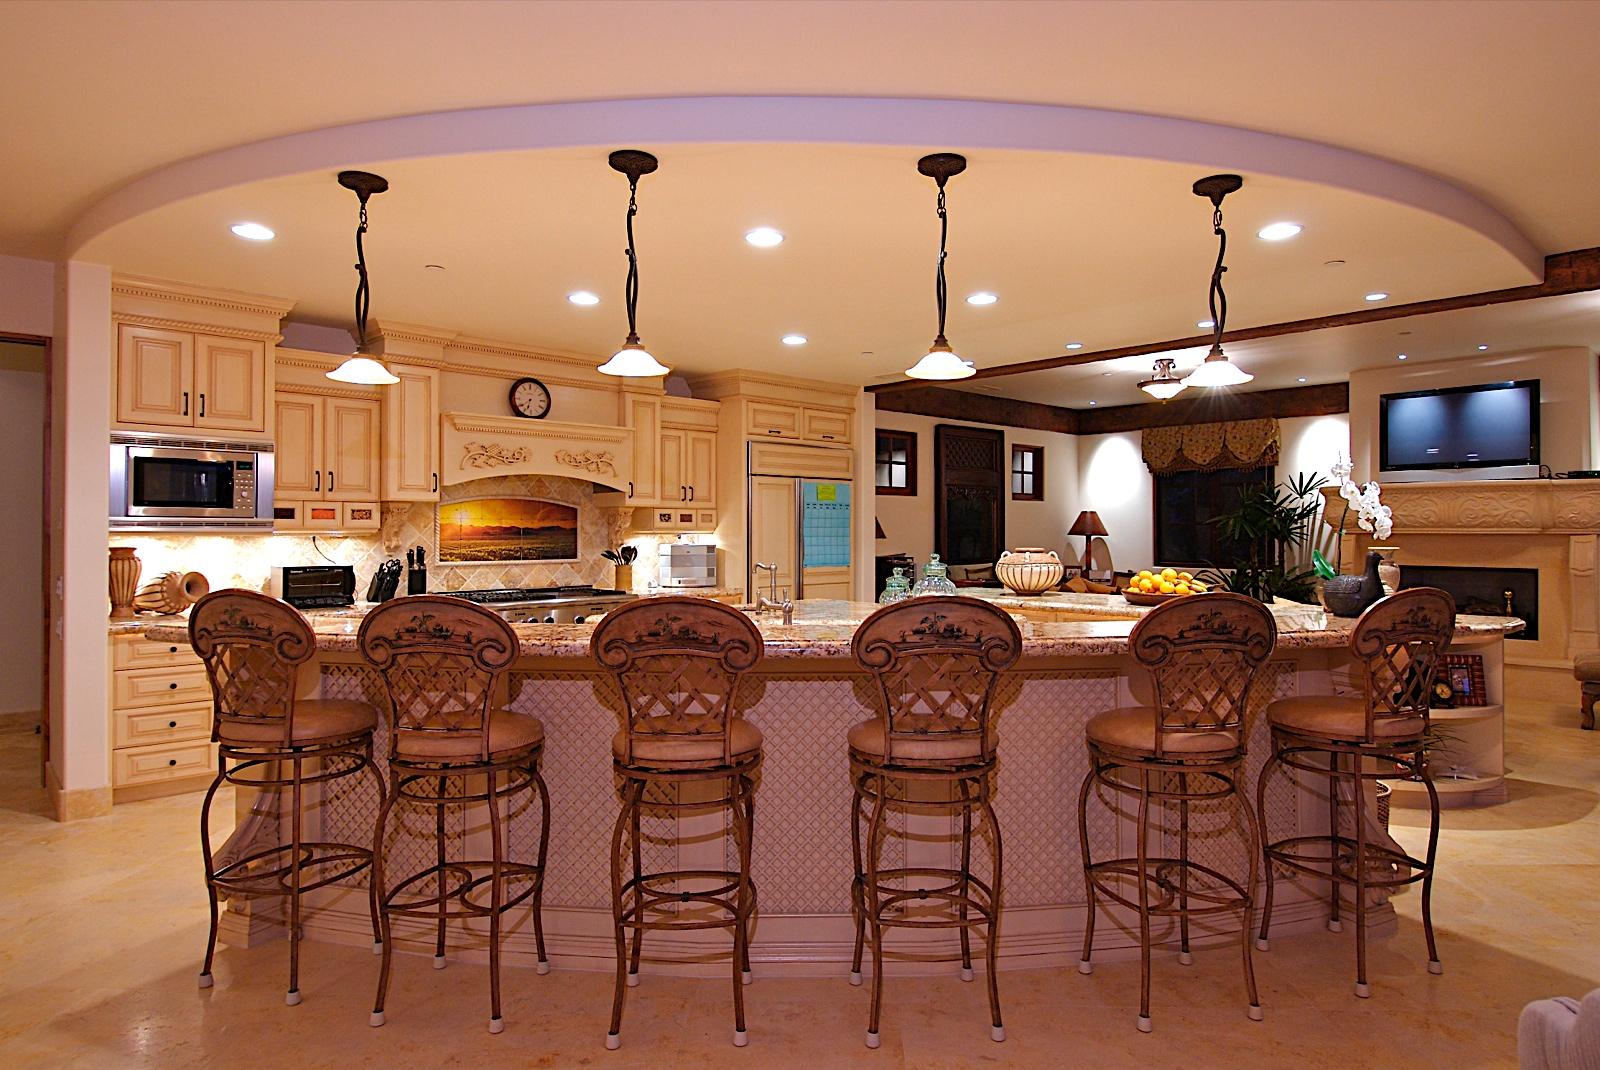 Marvelous Classic Arts Kitchen Lighting Design Wooden